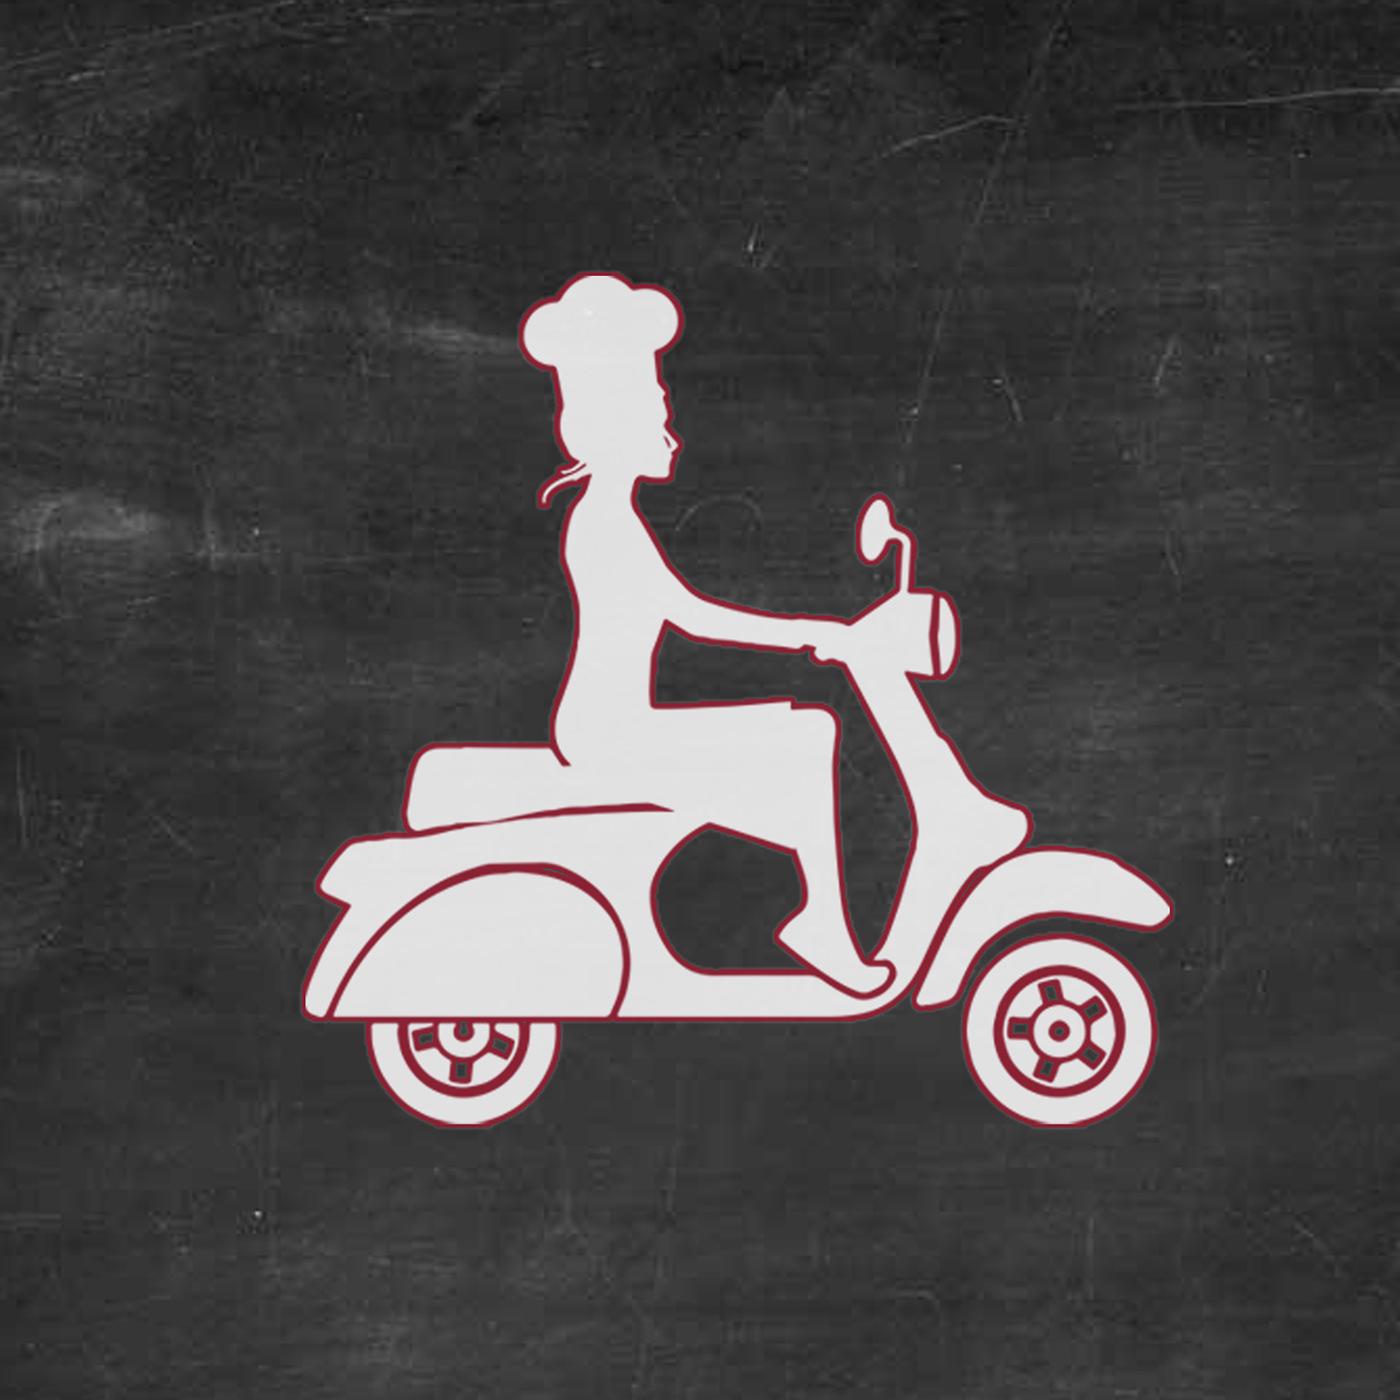 Image may contain: drawing, art and land vehicle